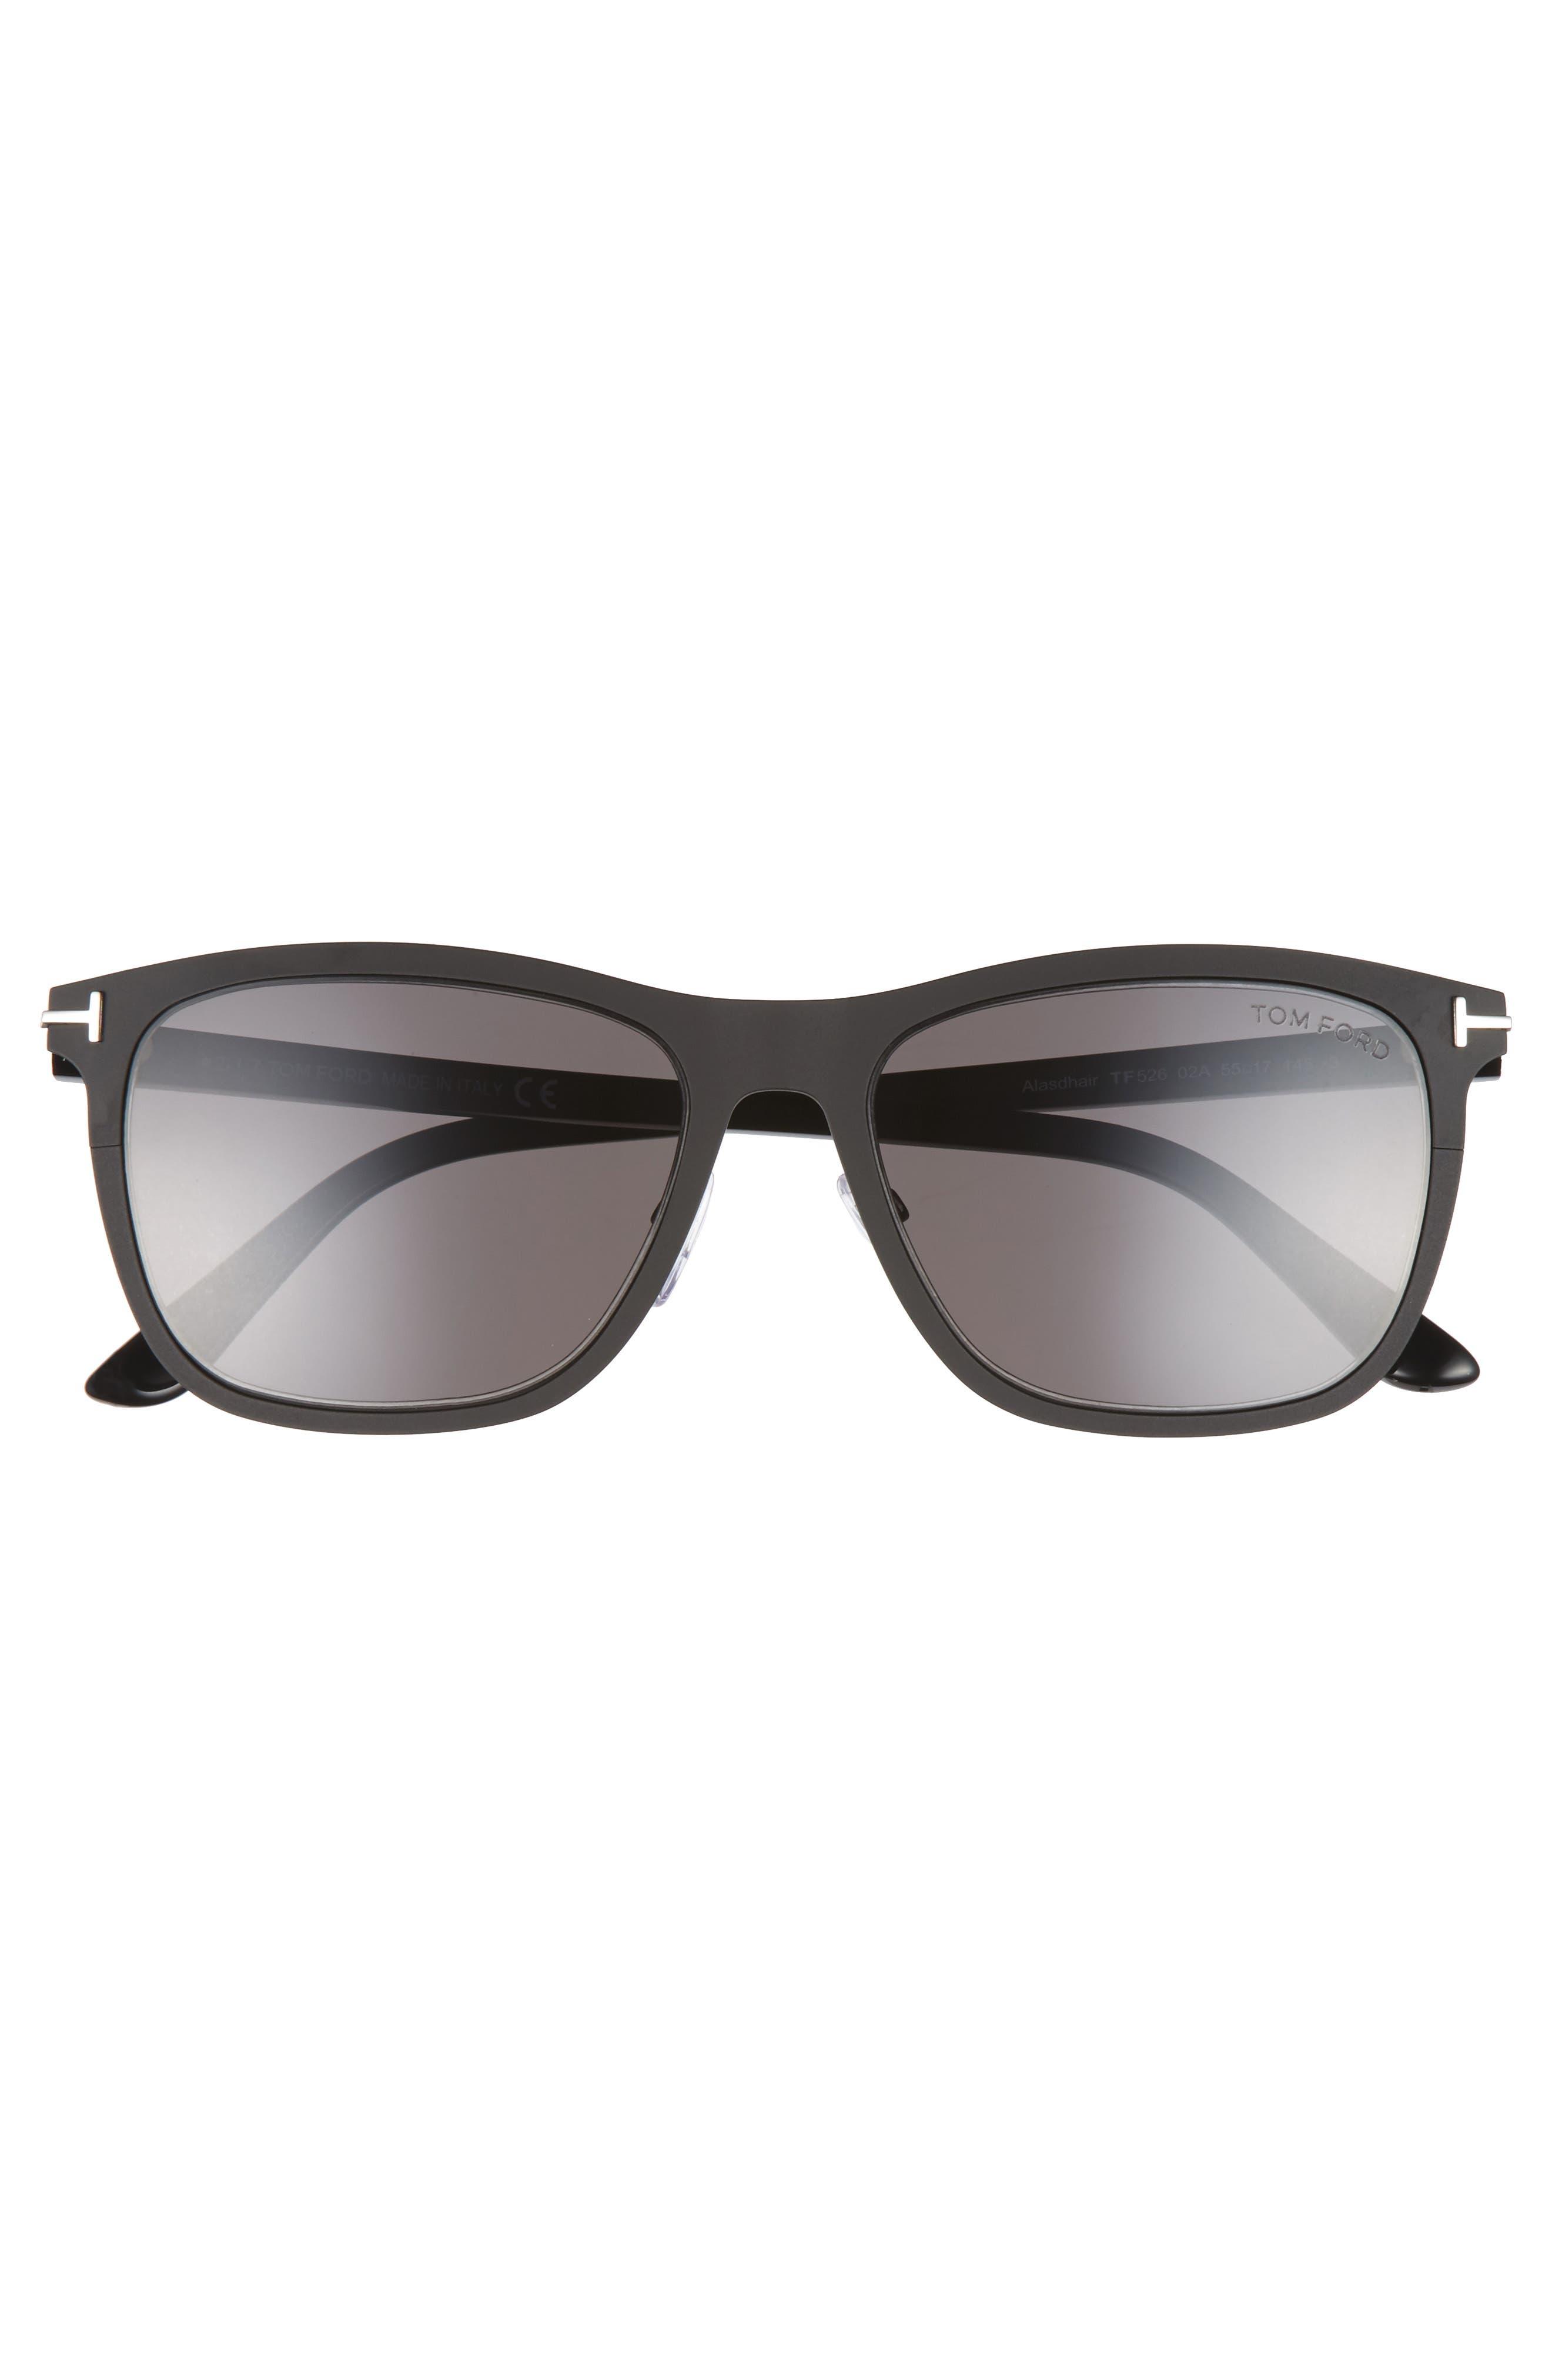 Alasdhair 55mm Sunglasses,                             Alternate thumbnail 2, color,                             013